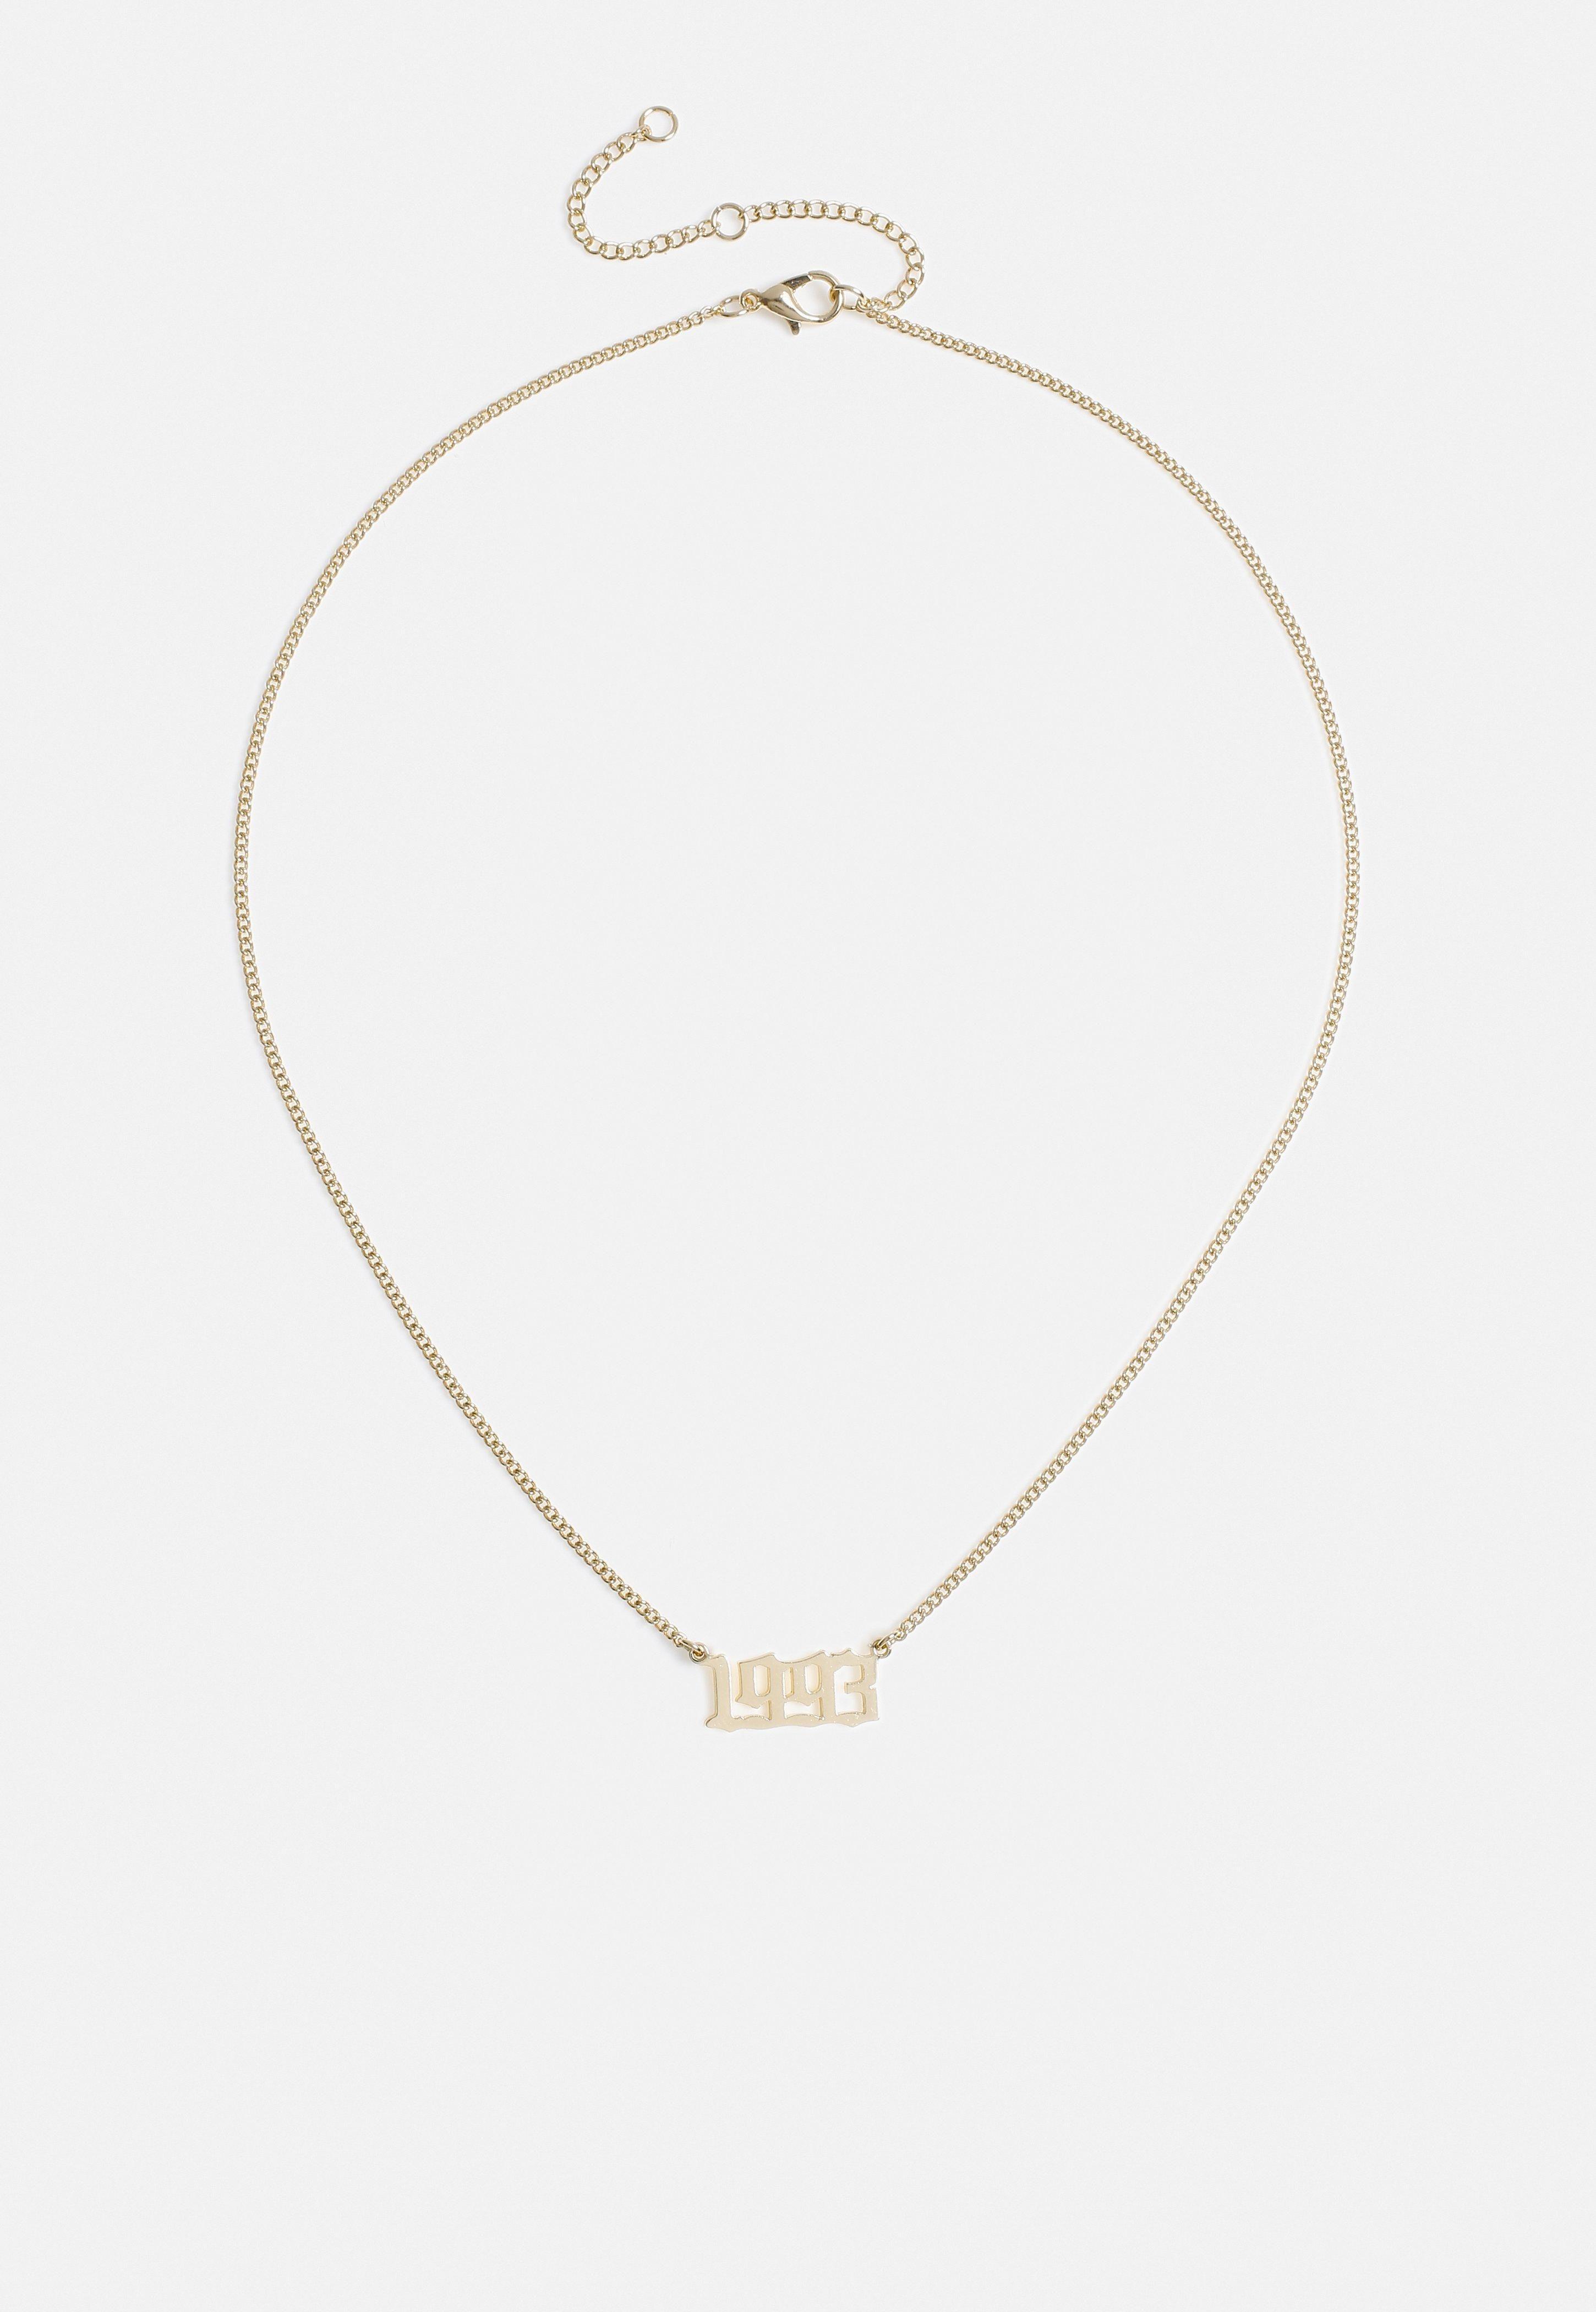 Gold Look Birth Year 1993 Necklace Sponsored Birth Spon Gold Year Fashion Costume Jewelry Women Jewelry Jewelry